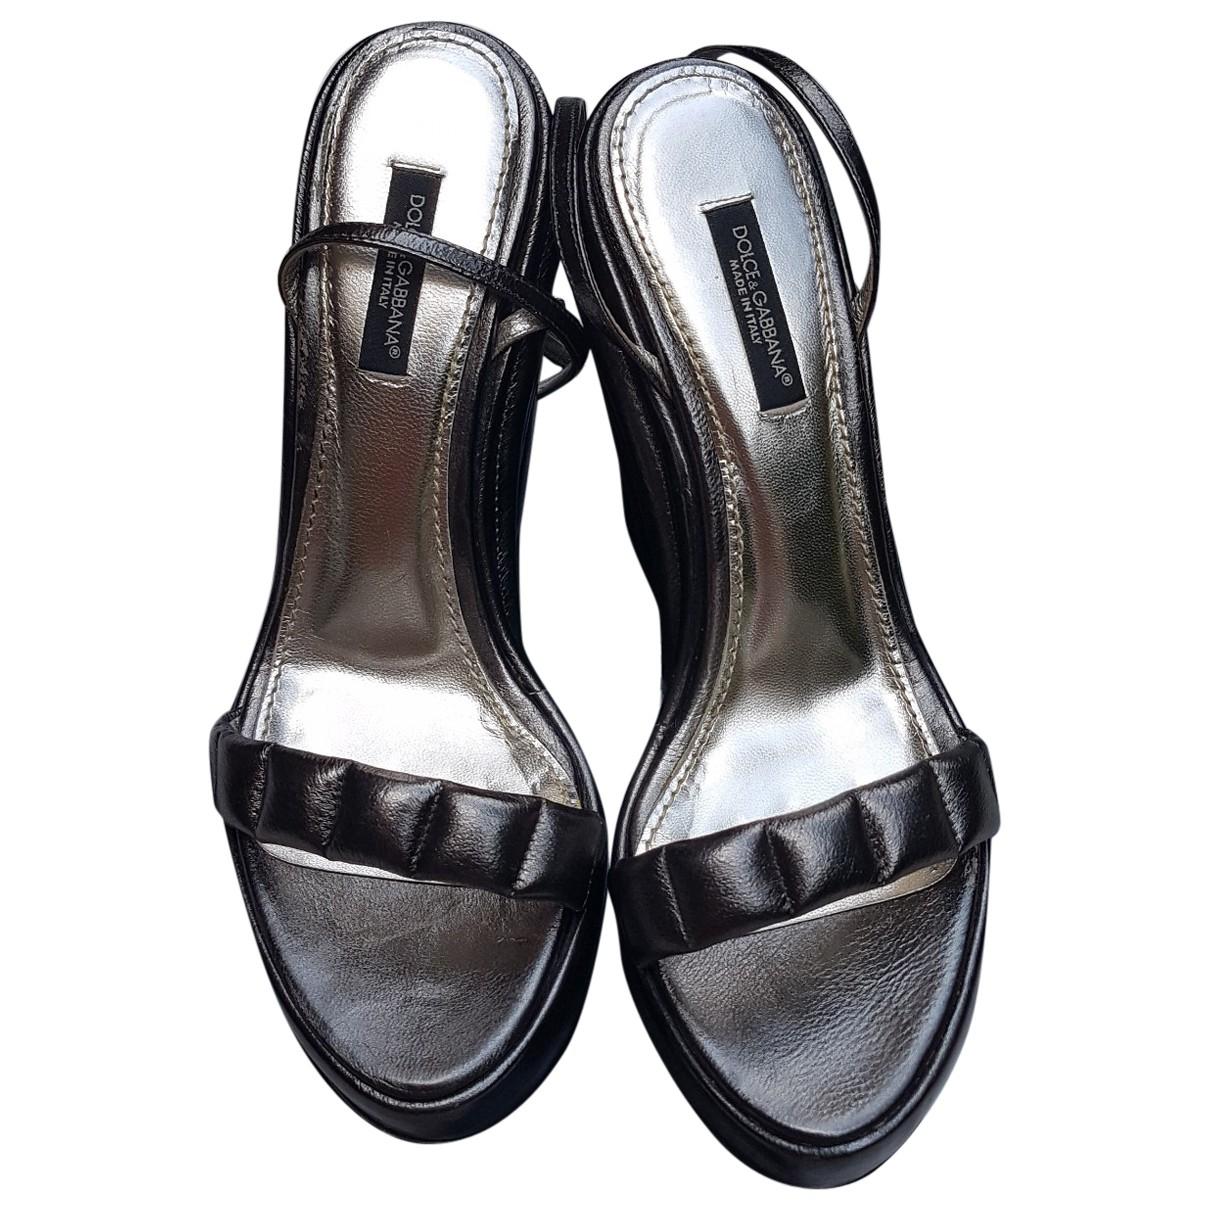 Dolce & Gabbana \N Grey Leather Sandals for Women 38 EU